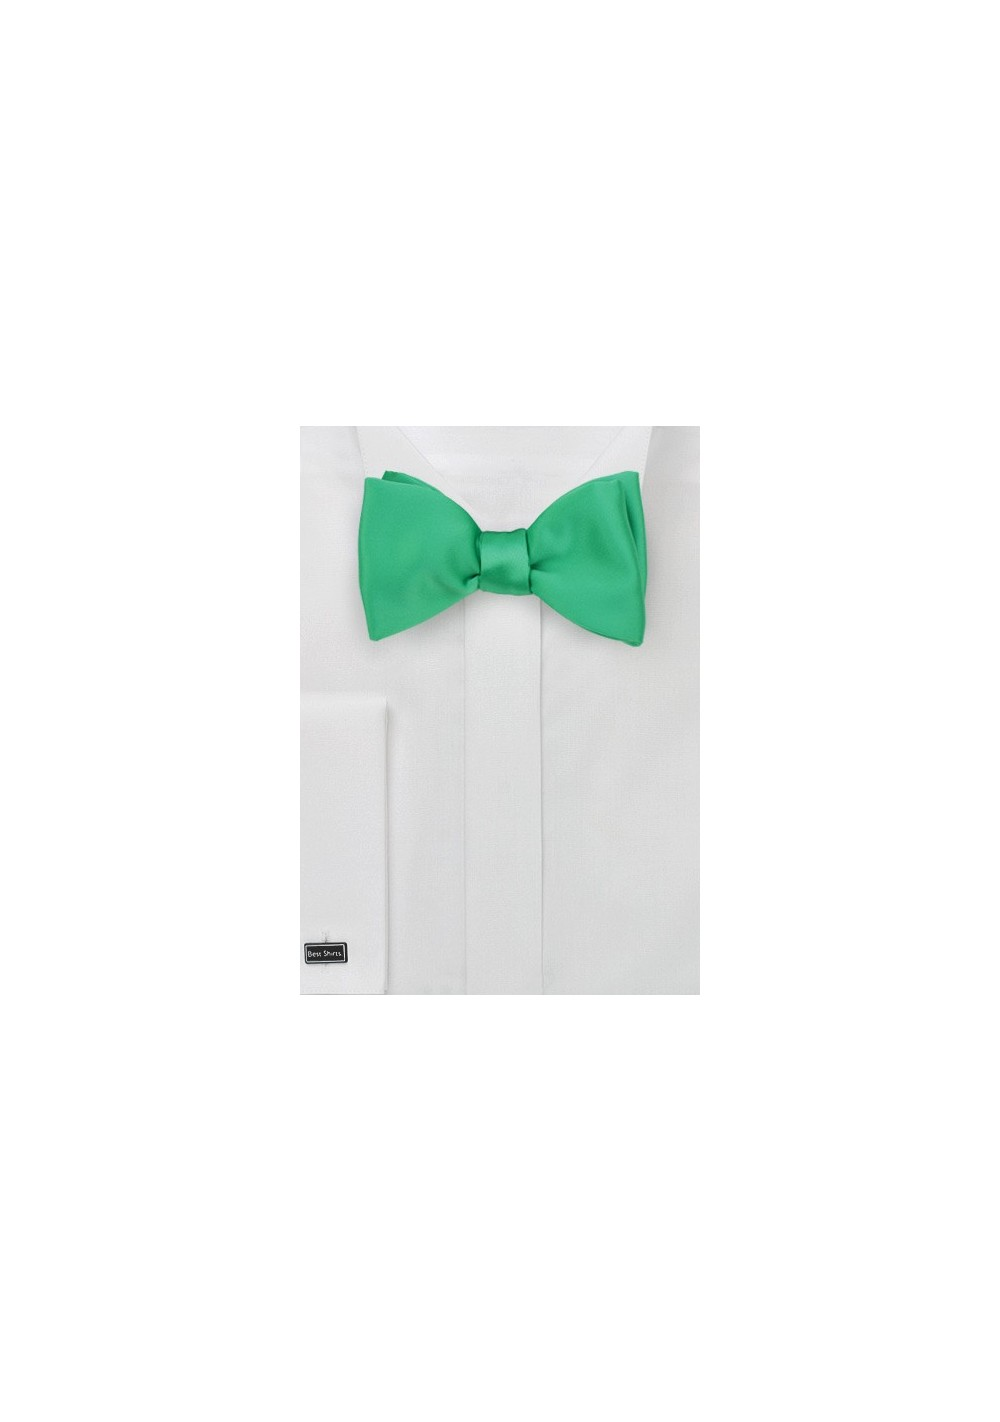 Self Tie Bow Tie in Emerald